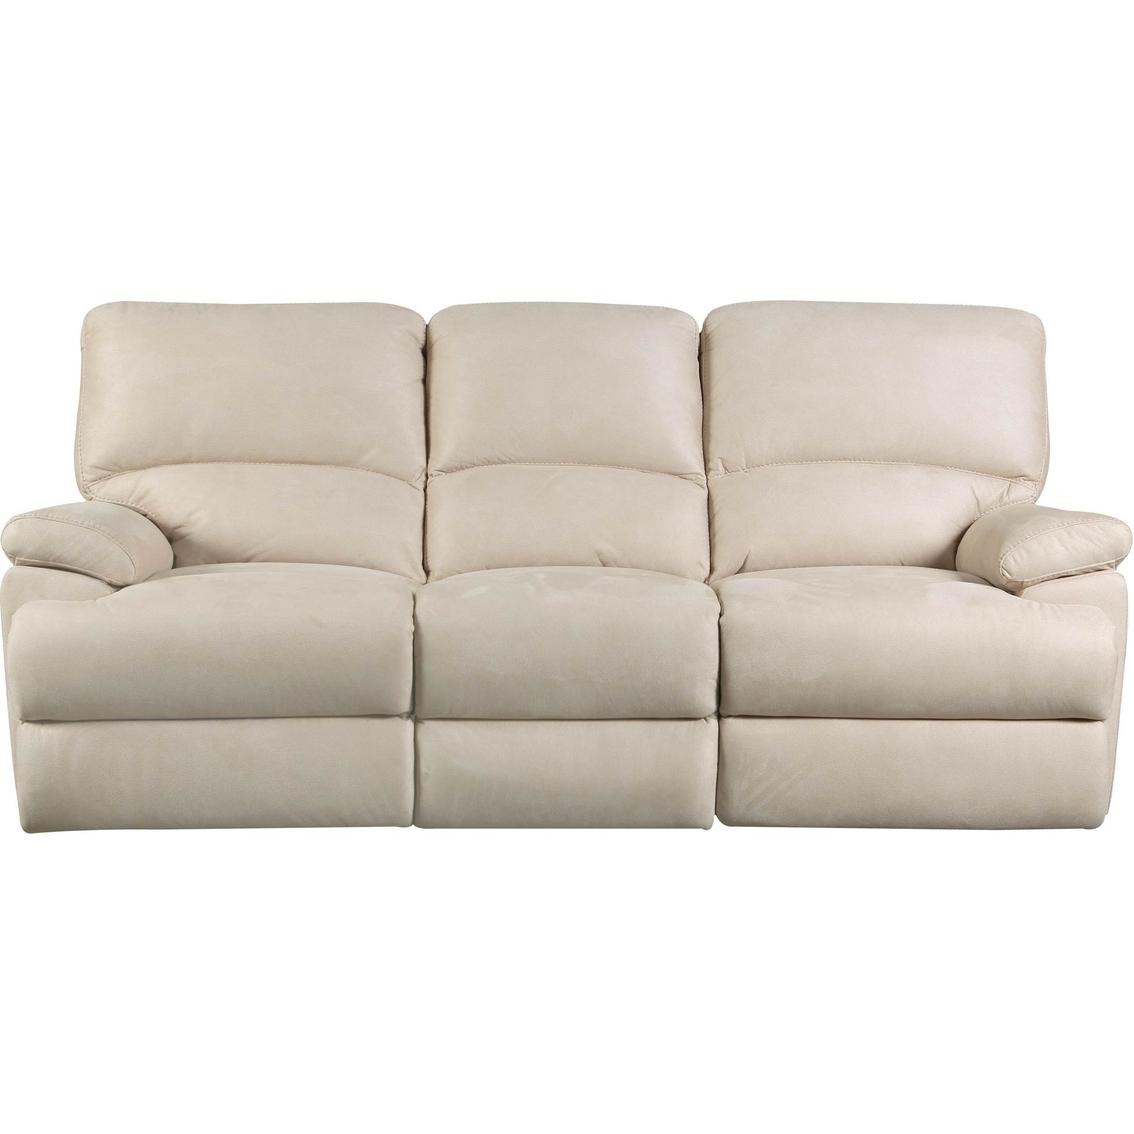 Bassett Tofino Leather Motion Sofa